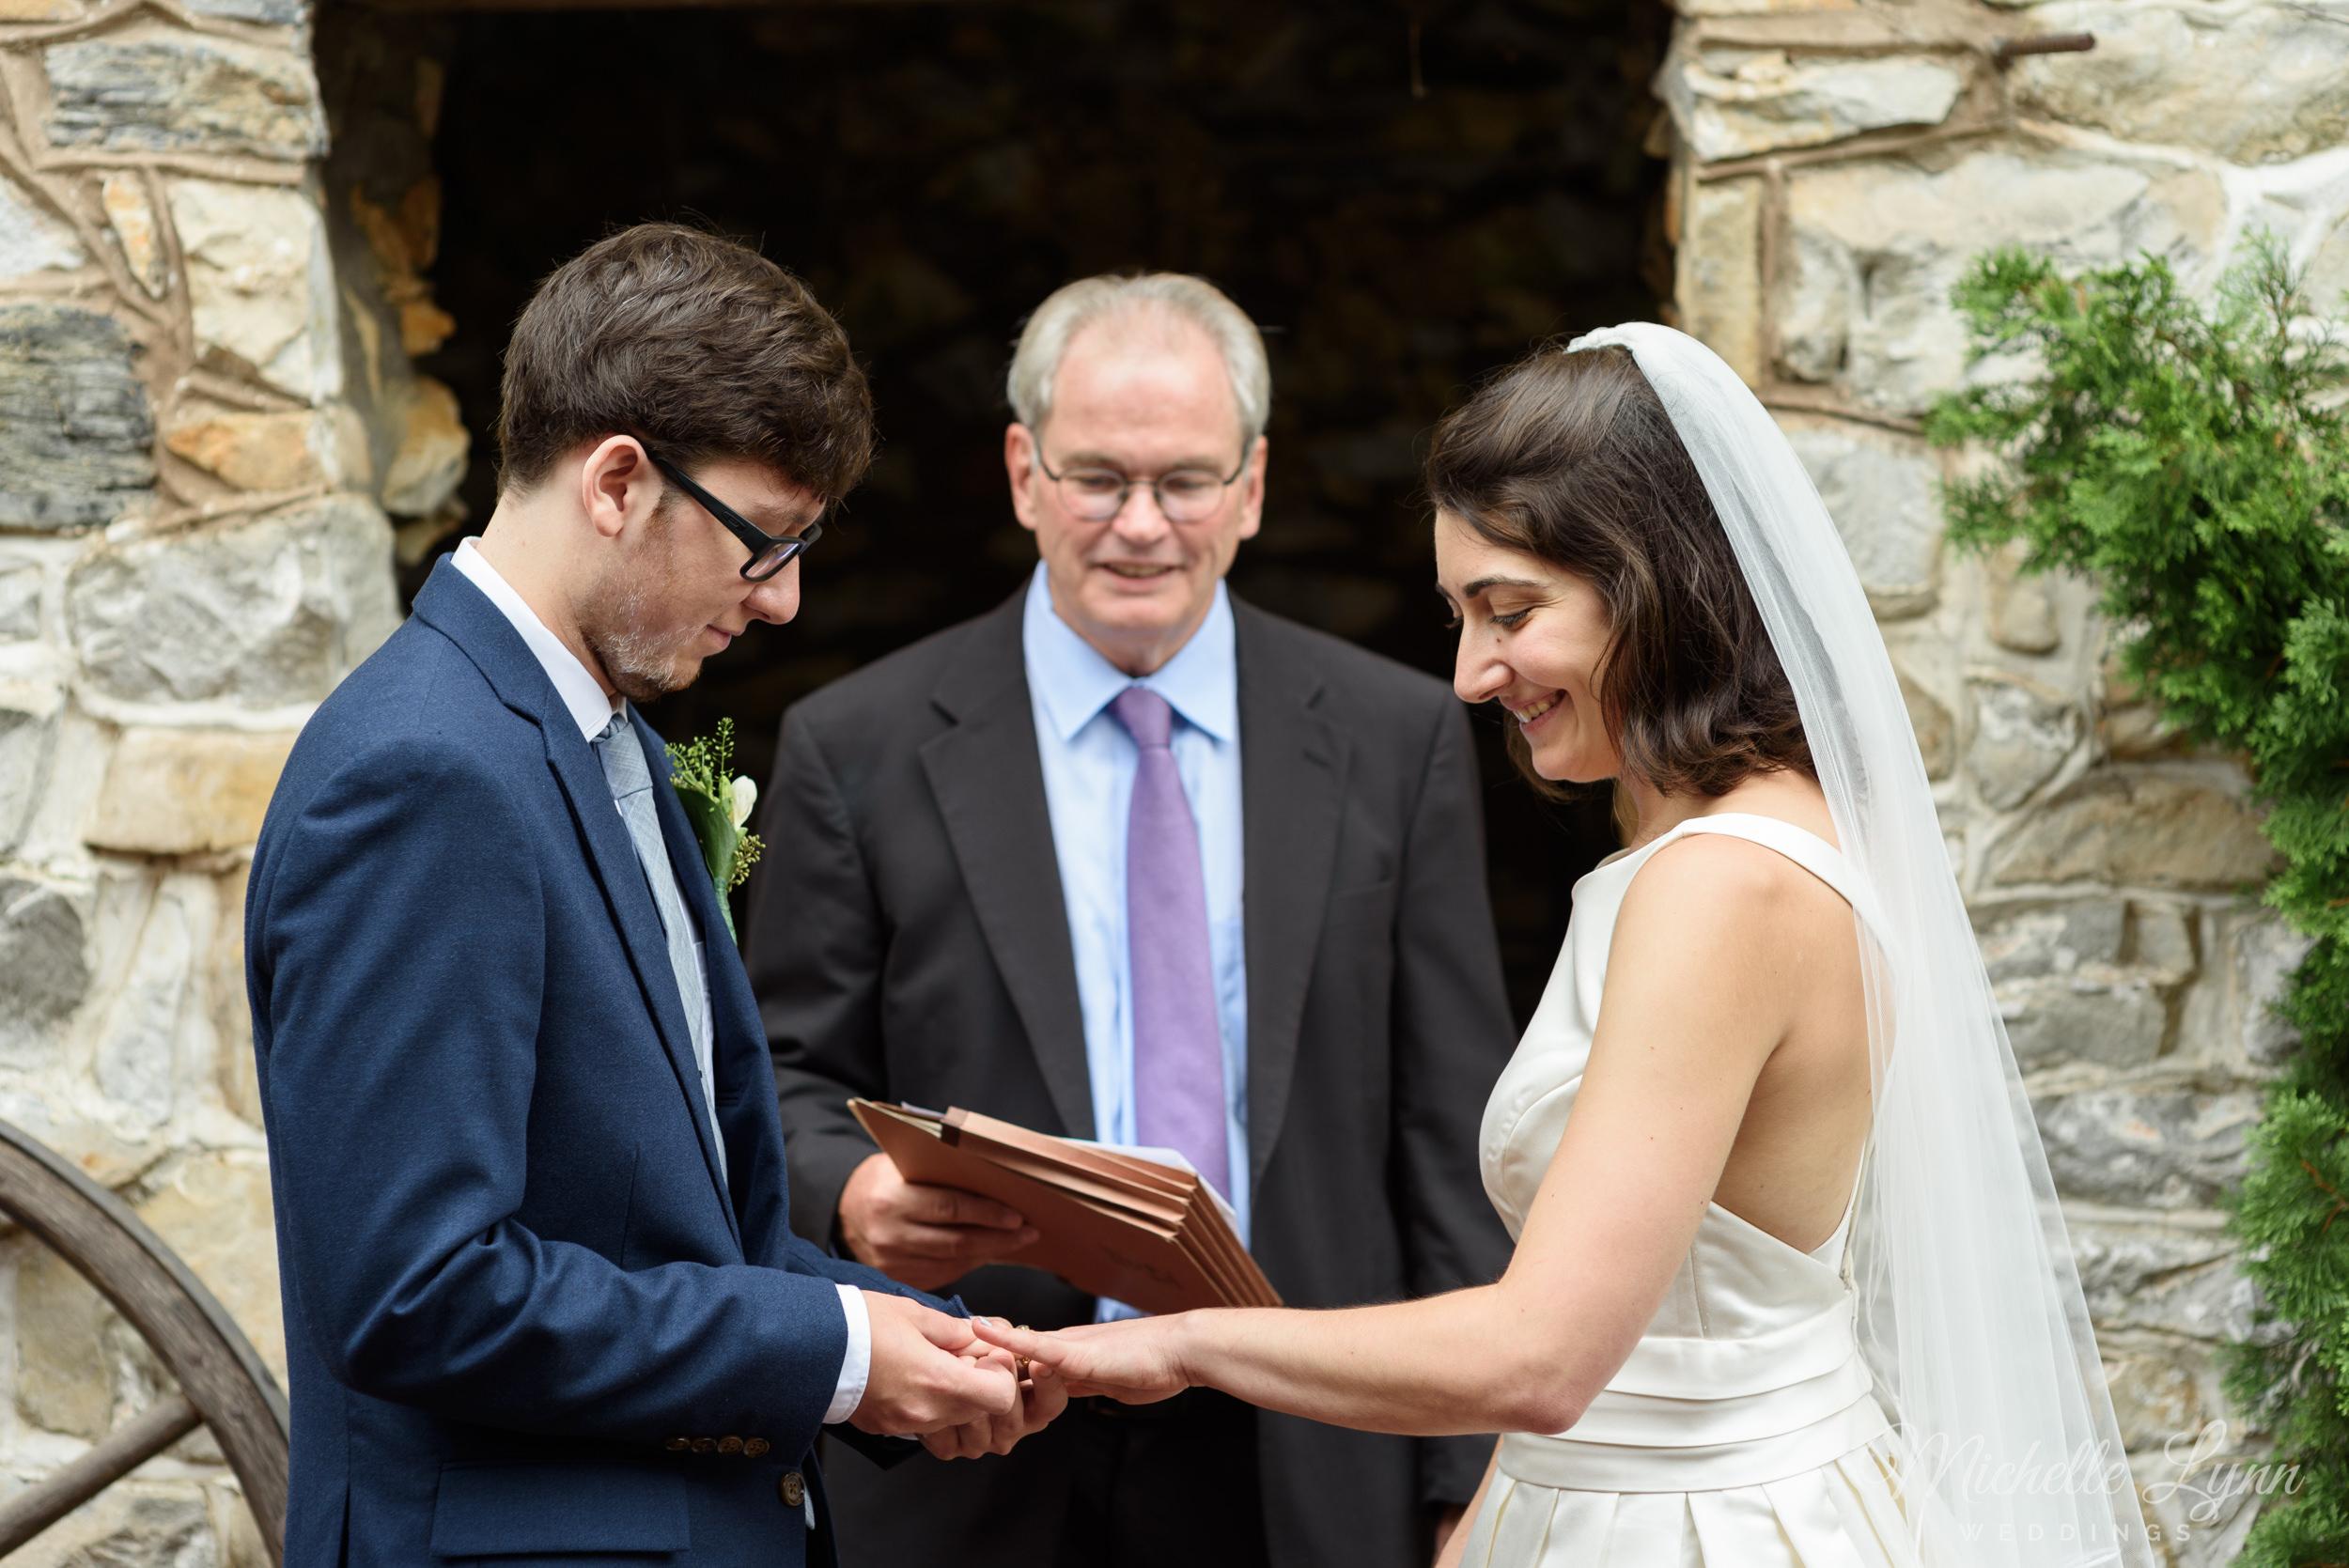 mlw-general-warren-malvern-wedding-photographer-49.jpg